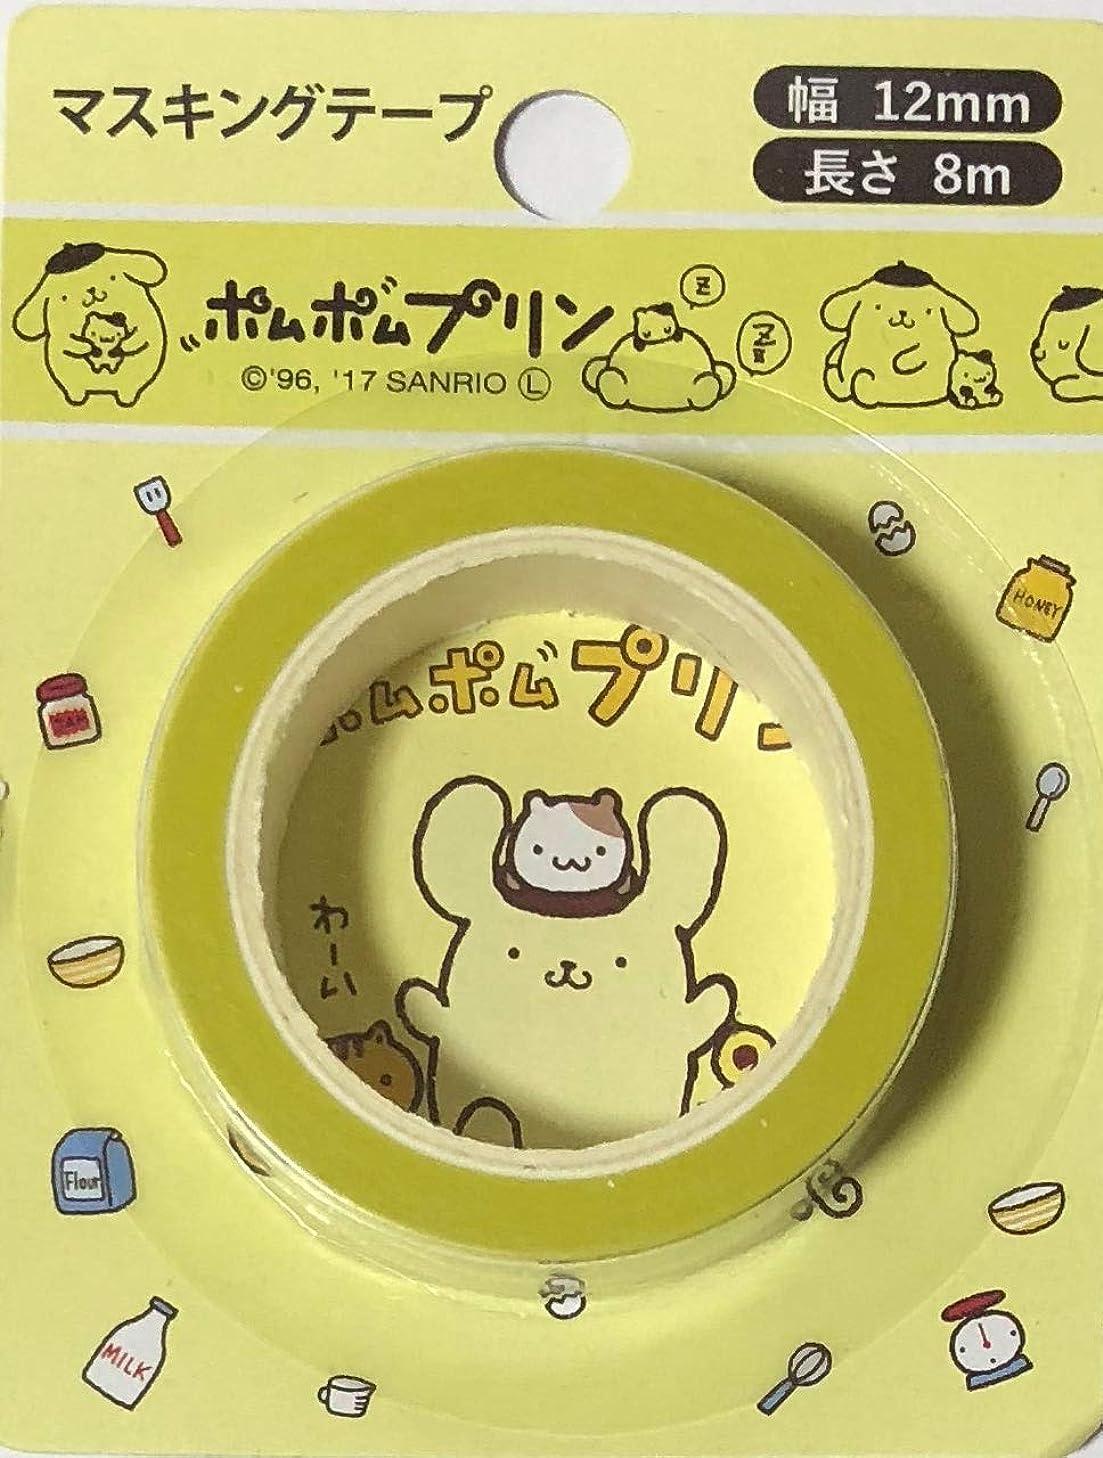 Sanrio Pompompurin Masking Tape Length 8m Width1.2 cm Sticker Decoration Arts, Crafts & Sewing Stationery Japan